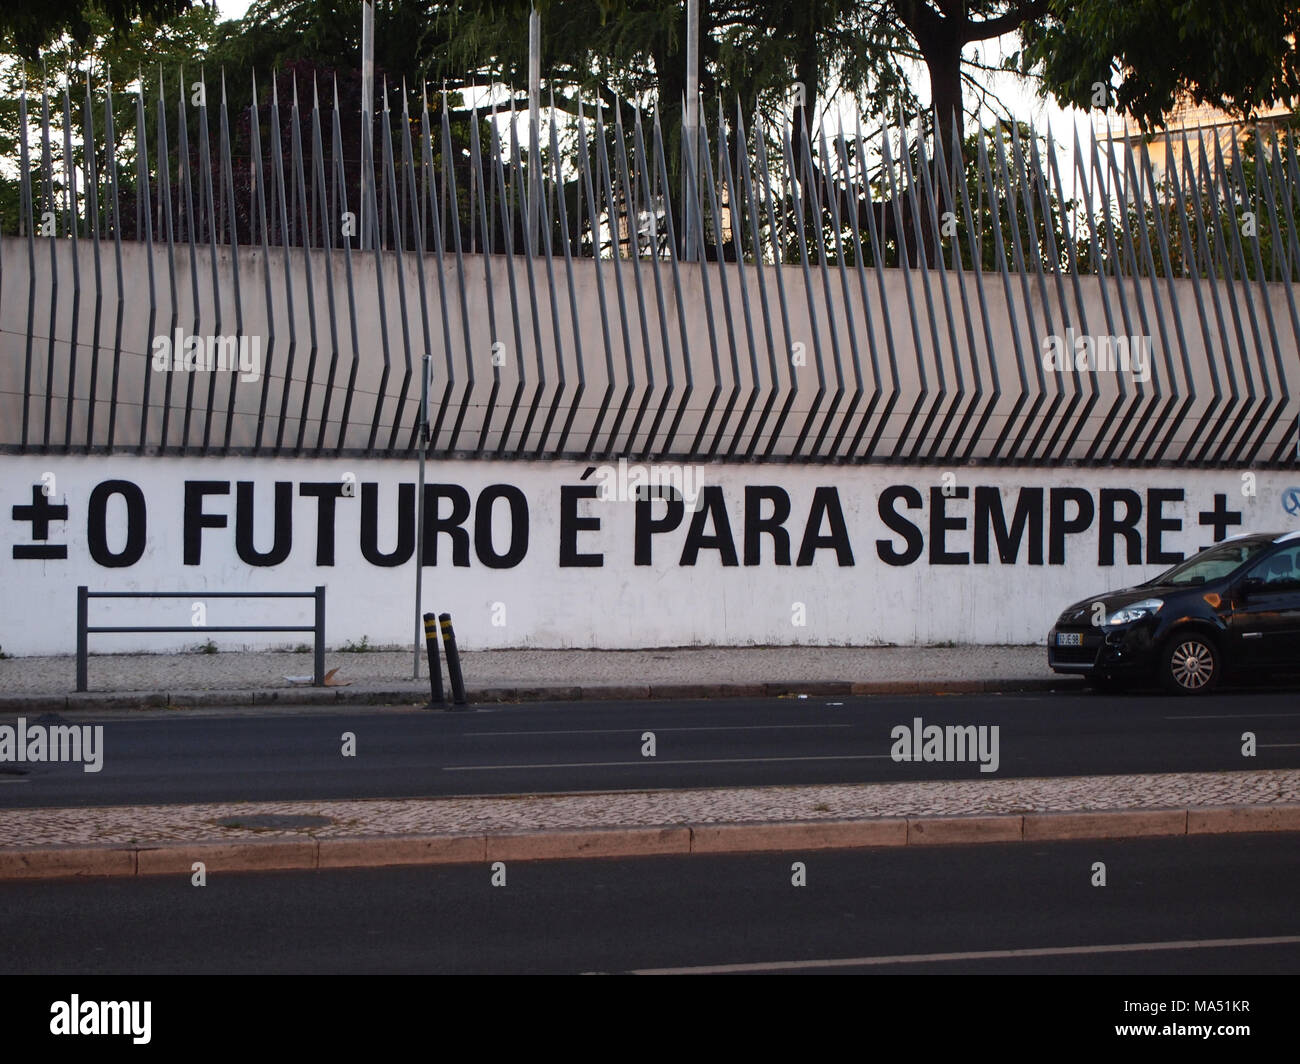 Thriving urban graffiti and street art scene in Lisbon - Stock Image